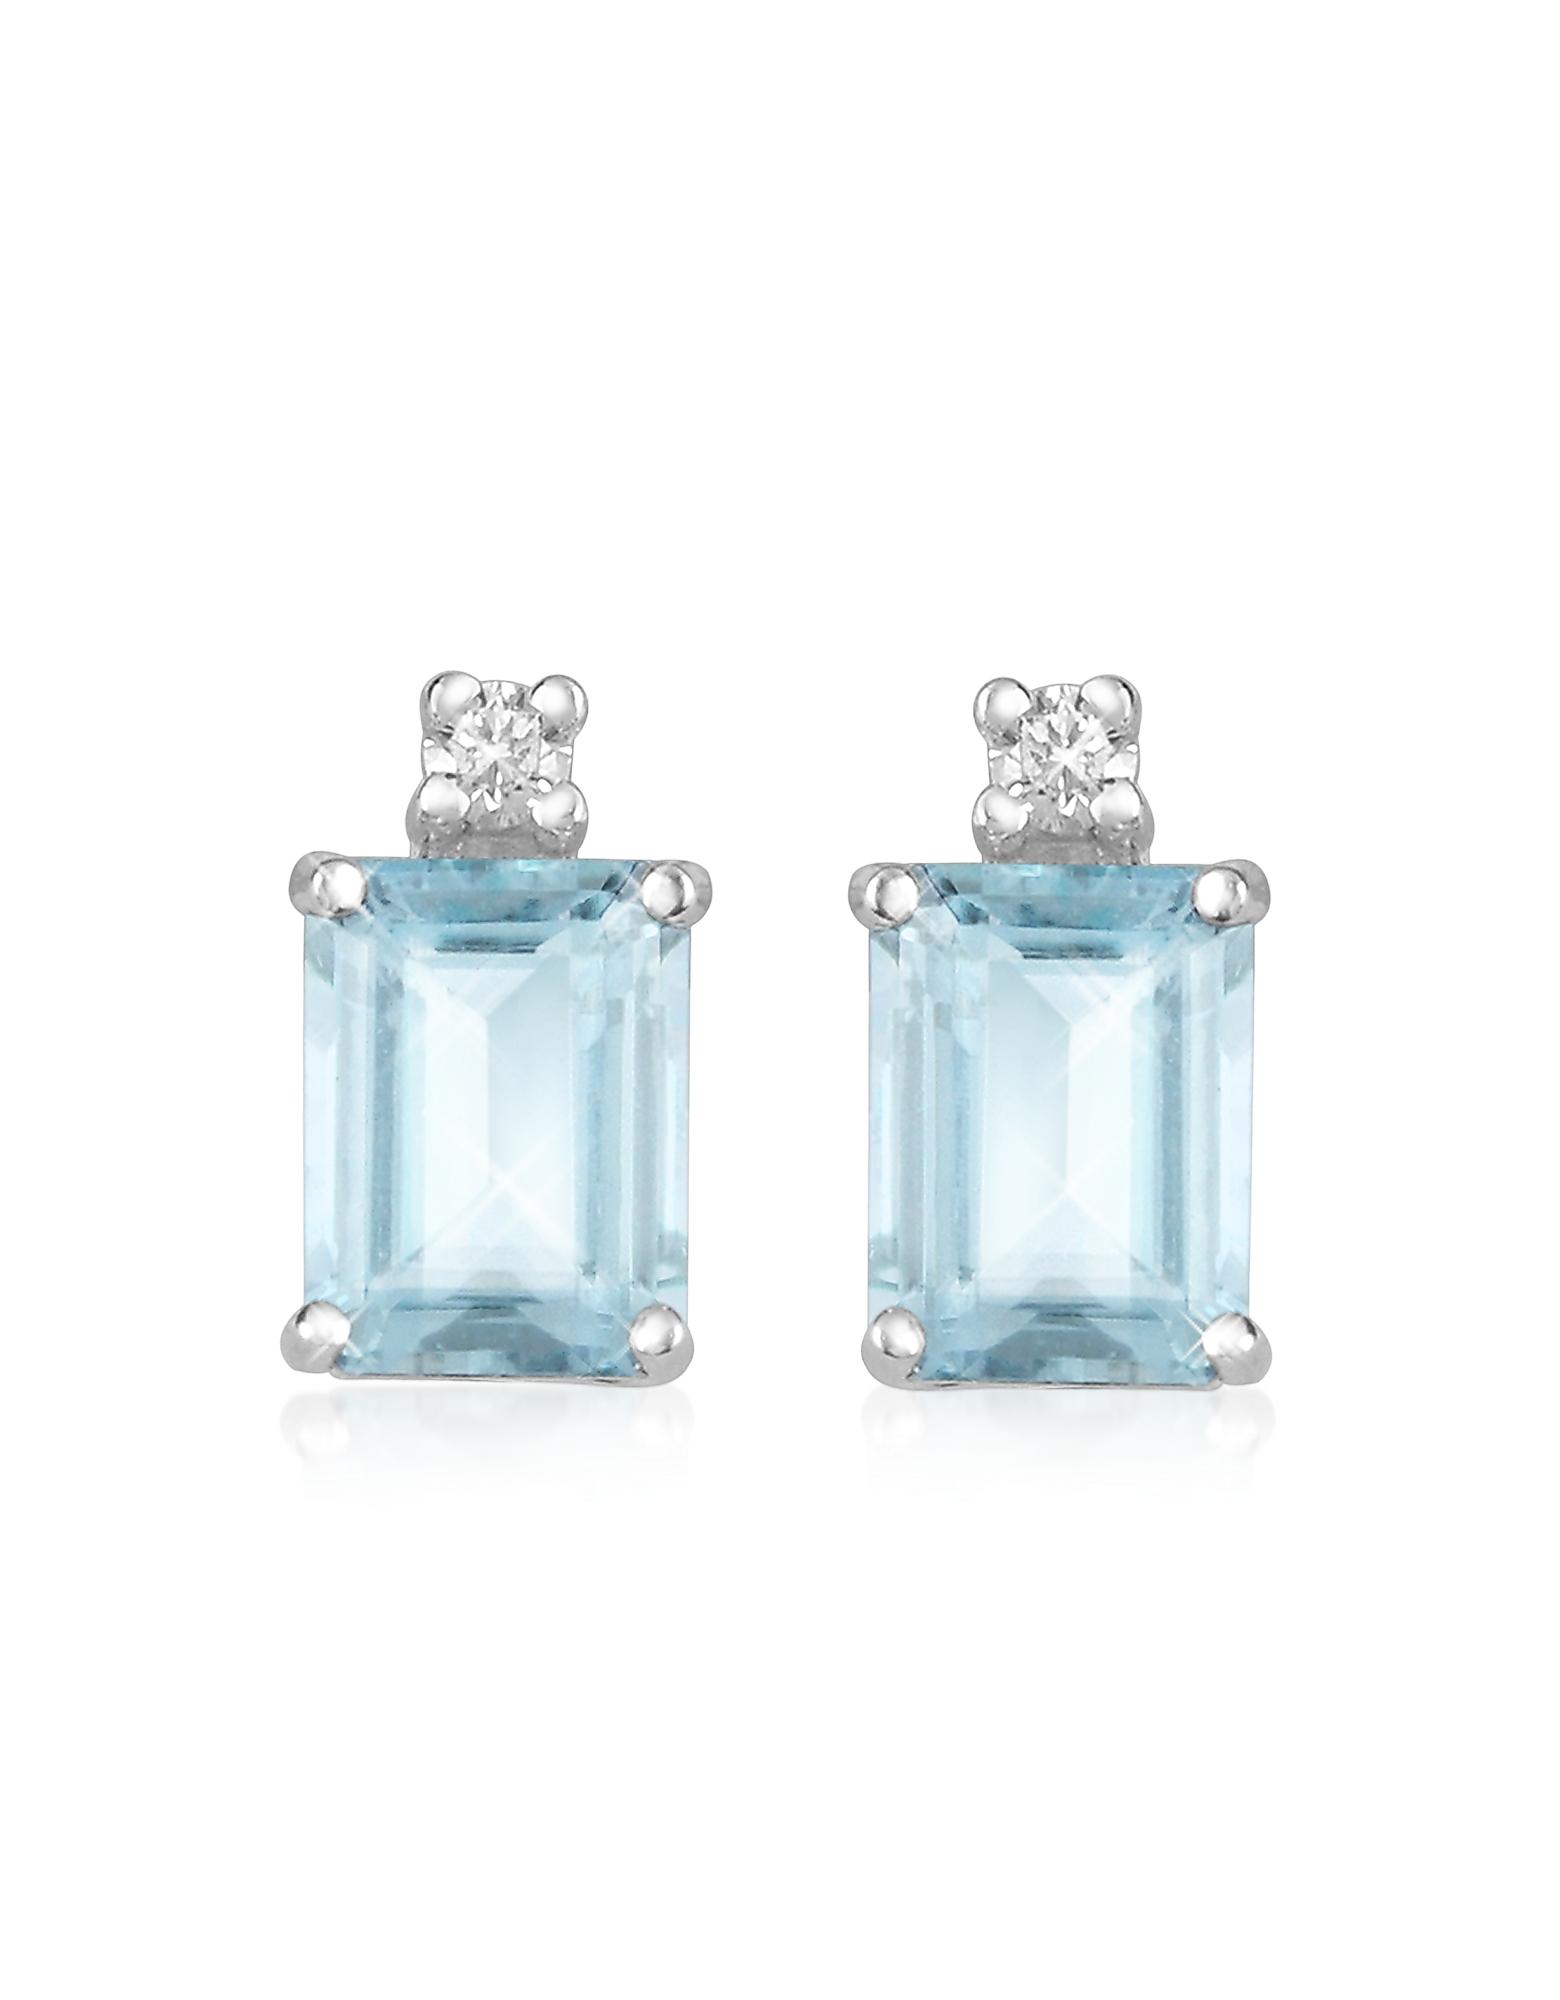 Incanto Royale Earrings, Aquamarine and Diamond 18K Gold Earrings